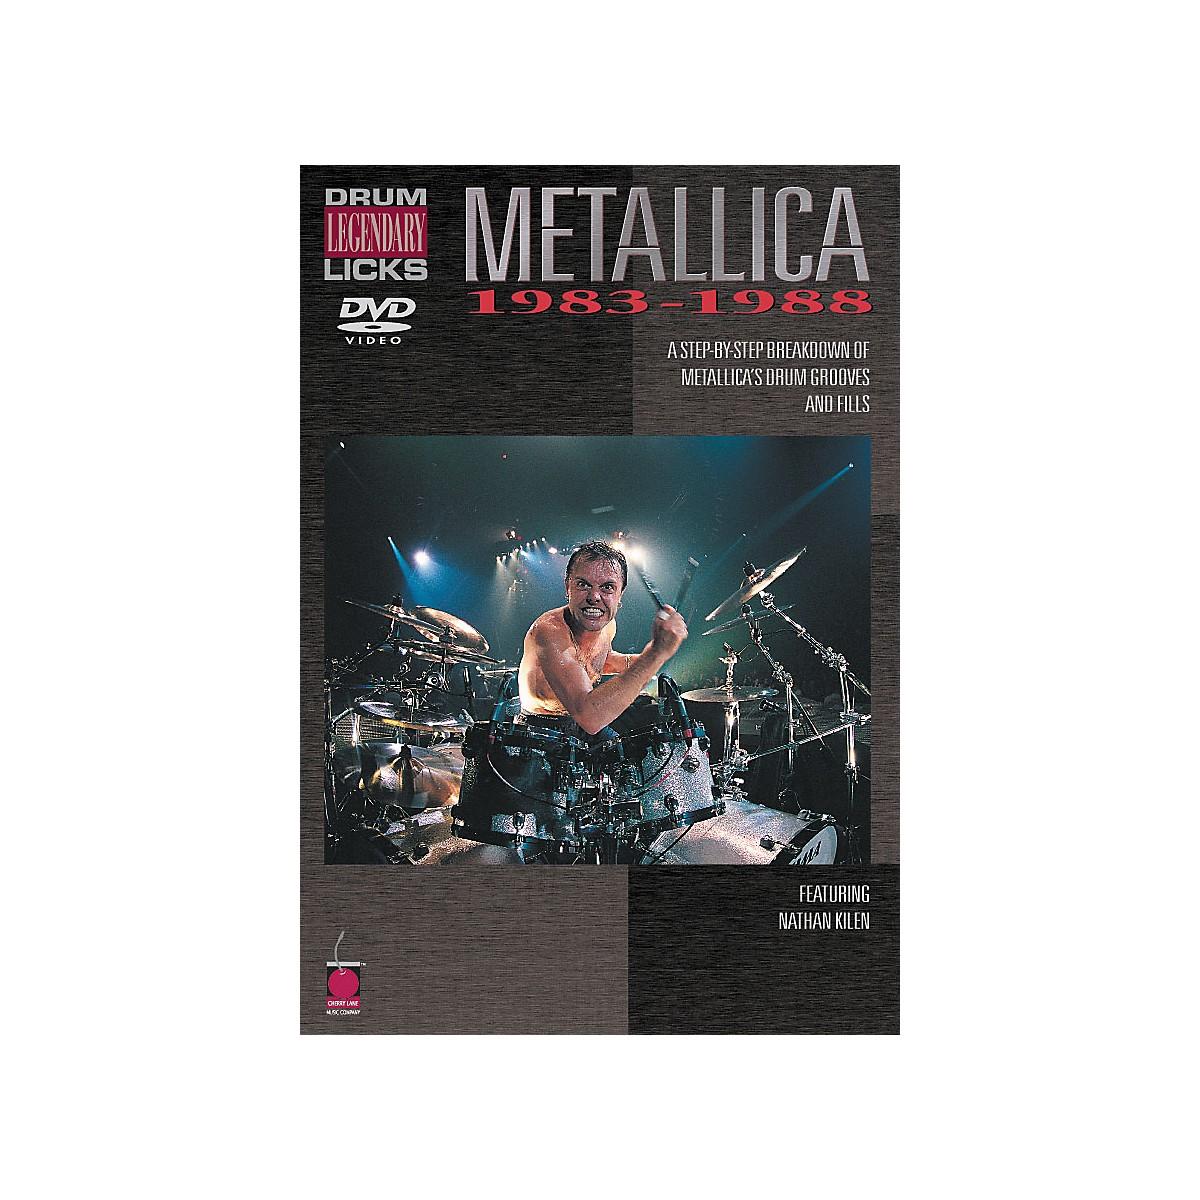 Cherry Lane Metallica - Drum Legendary Licks 1983-1988 DVD